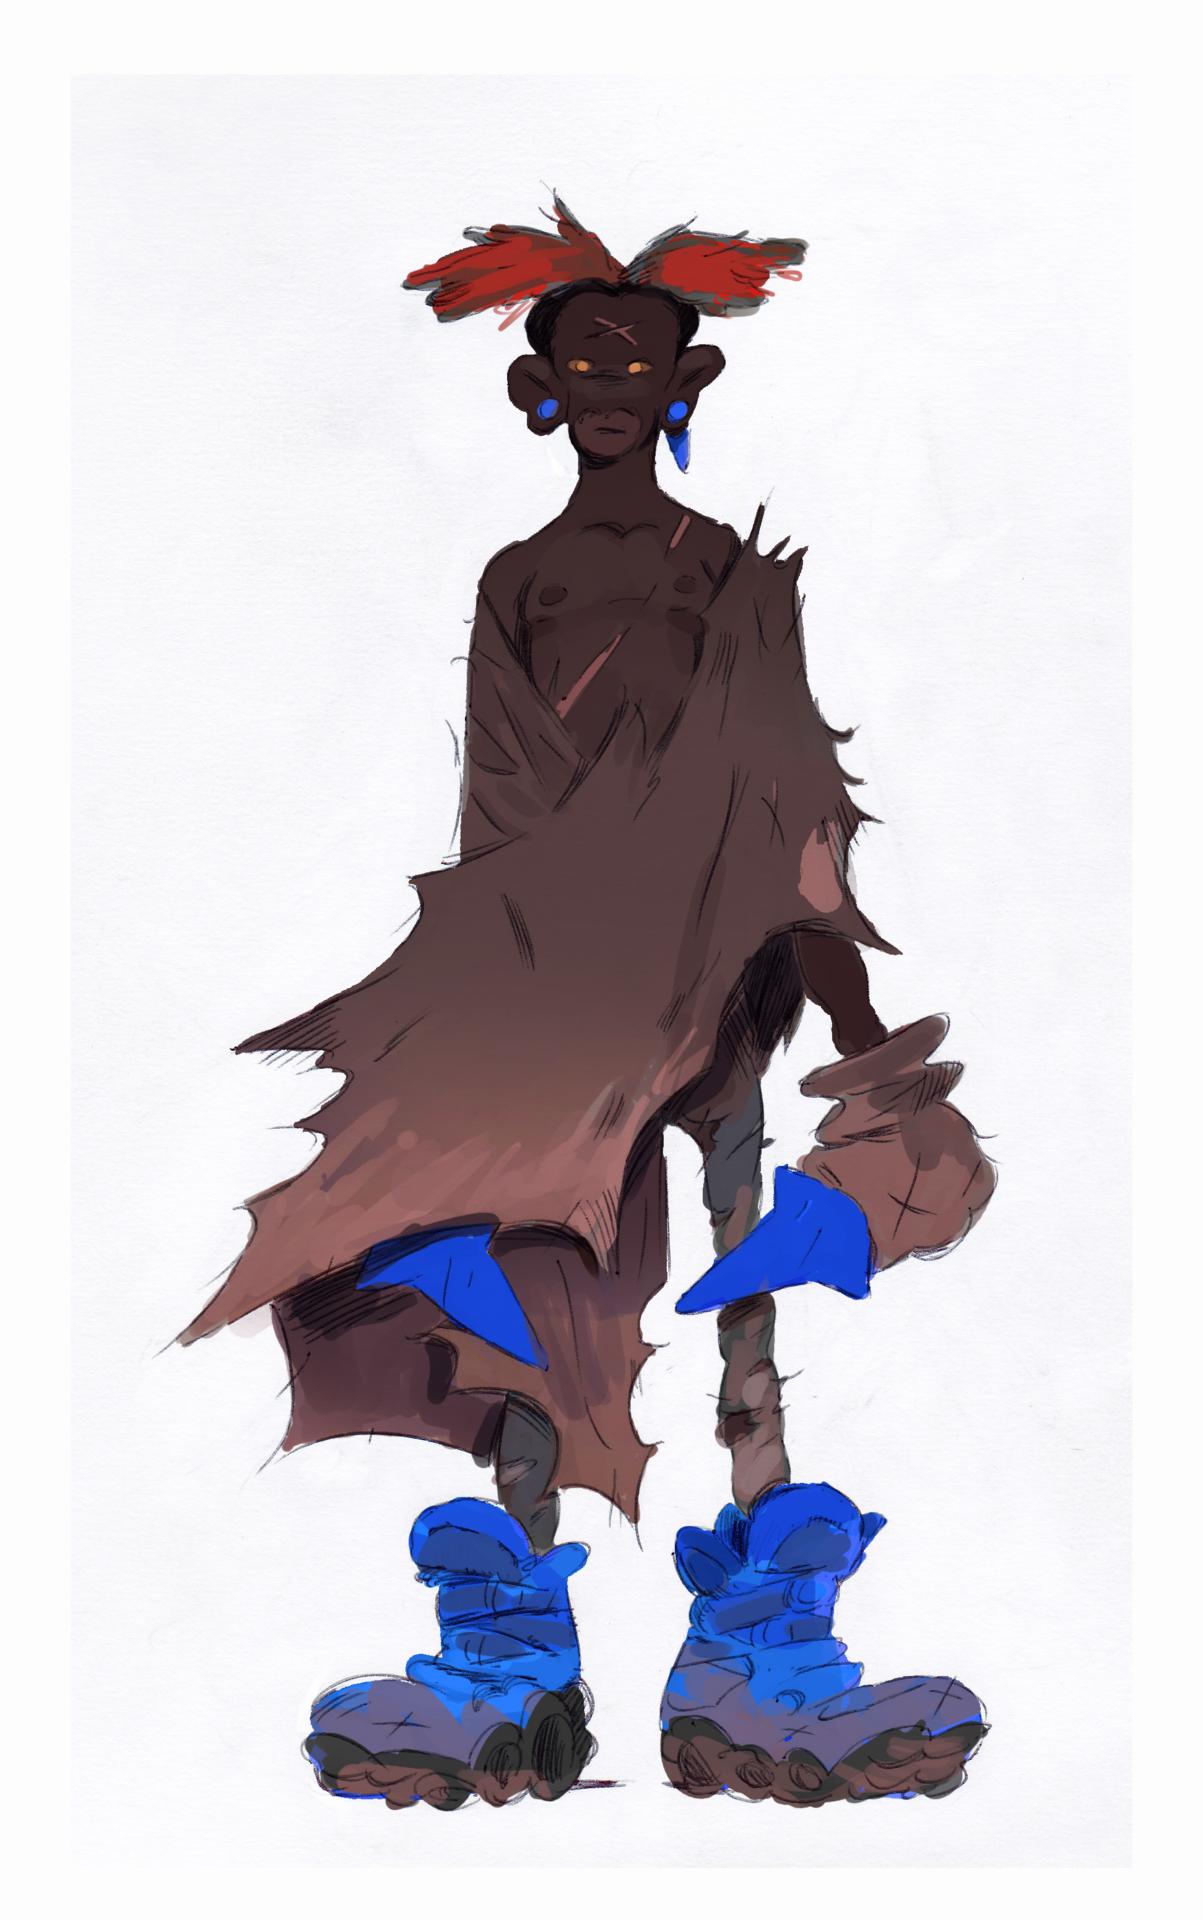 random character in 2020 Character, Character design, 2d art